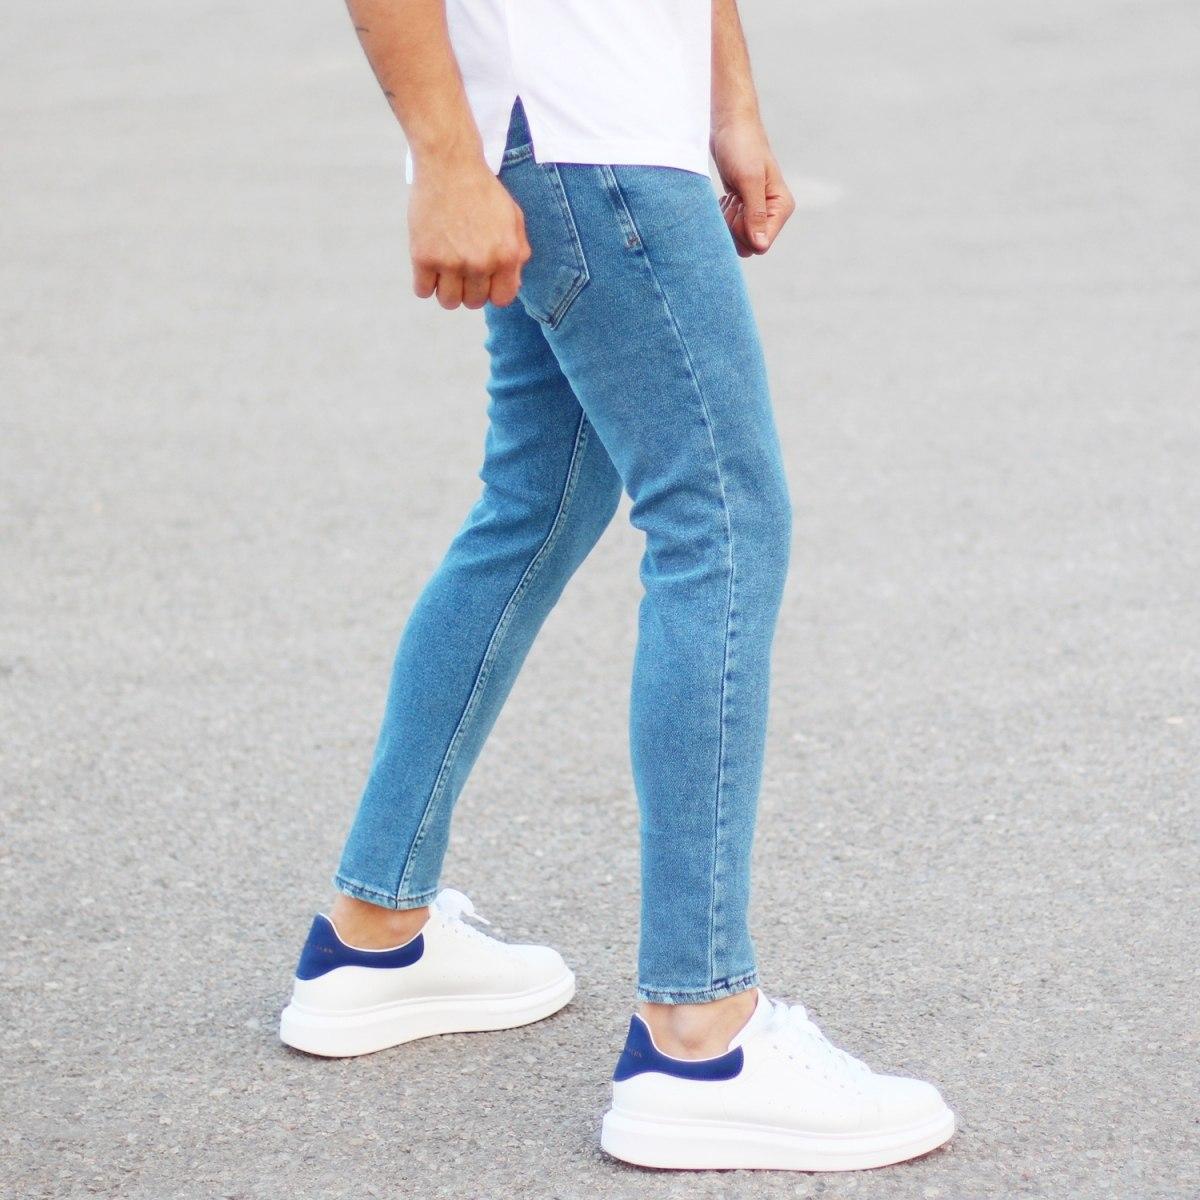 Men's Basic Fit Jeans In Blue Mv Premium Brand - 3